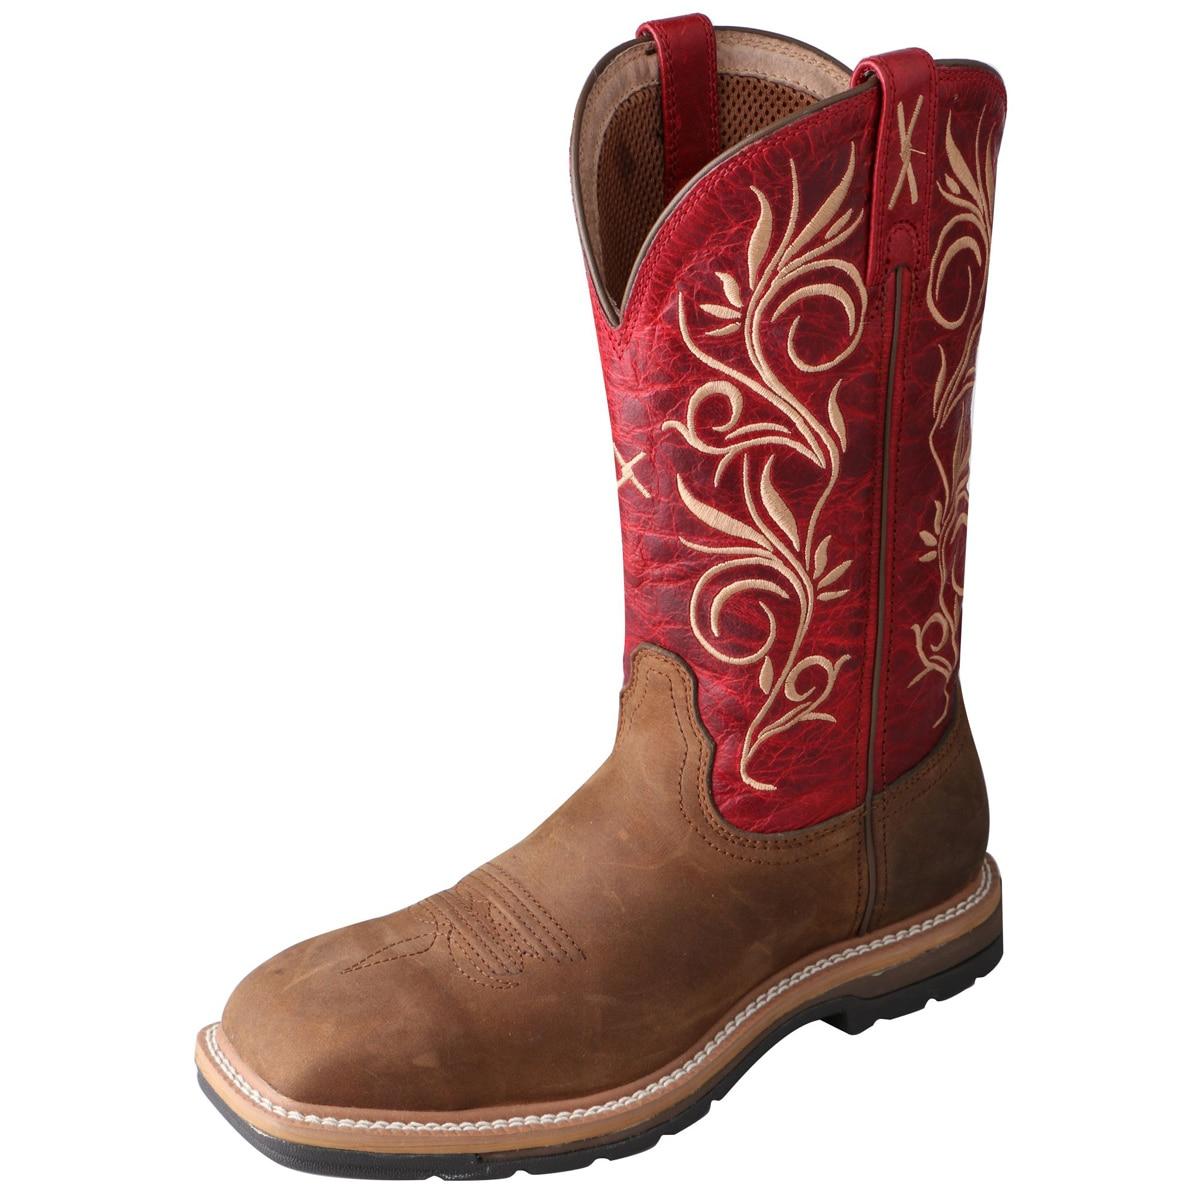 Twisted X Women's Lite Cowboy Work Boots